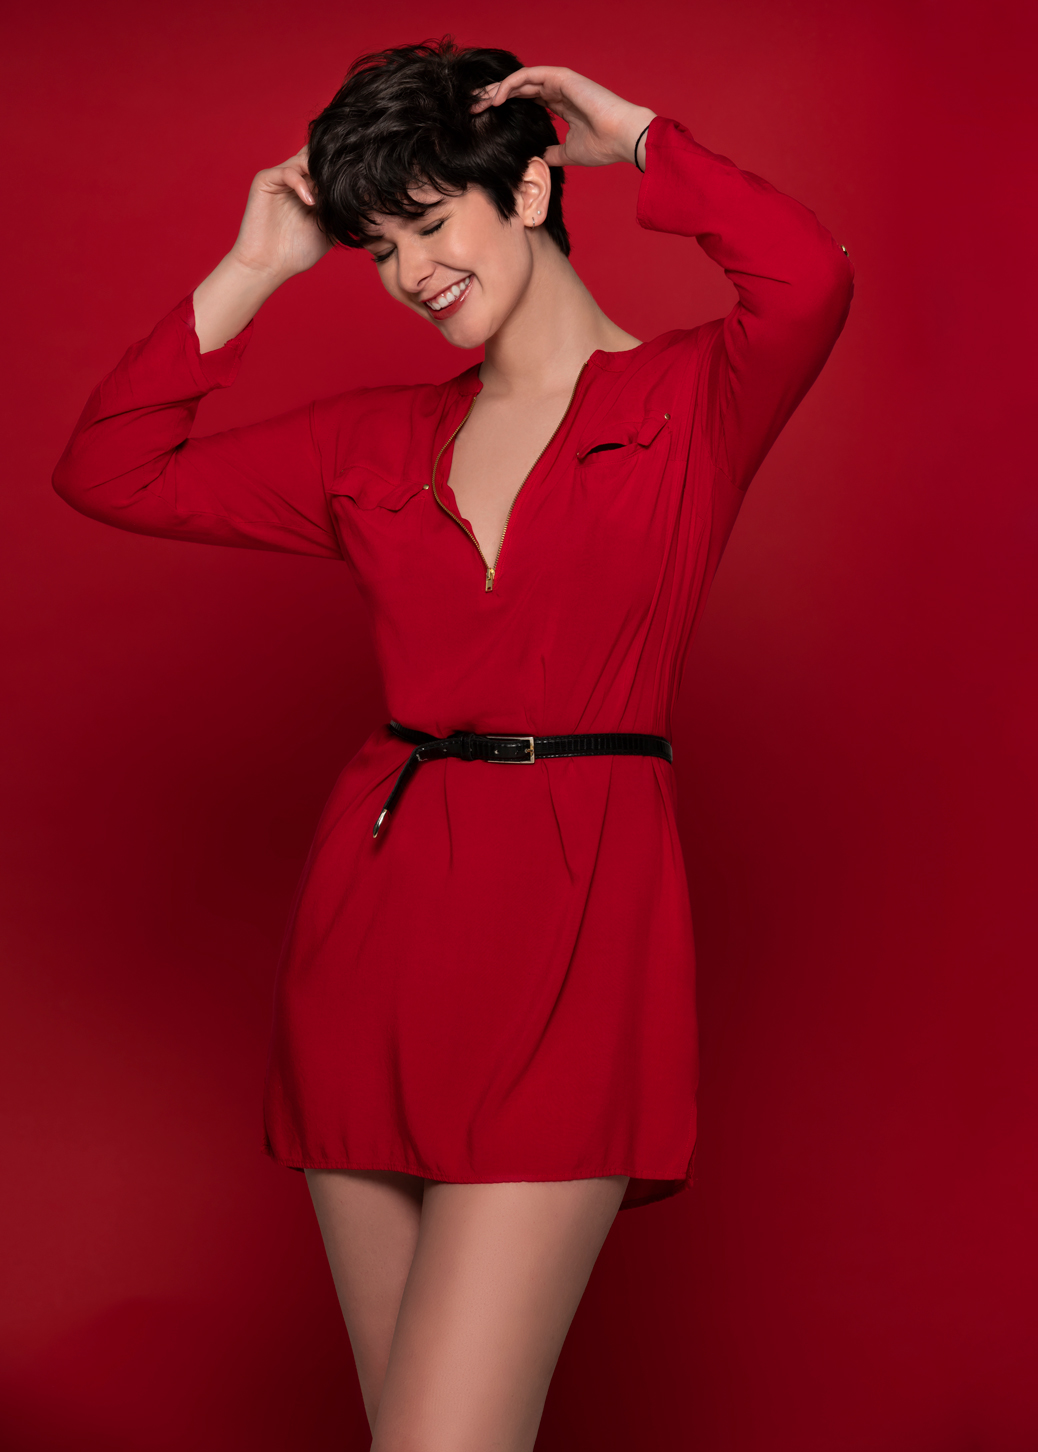 fashion model wearing a red dress